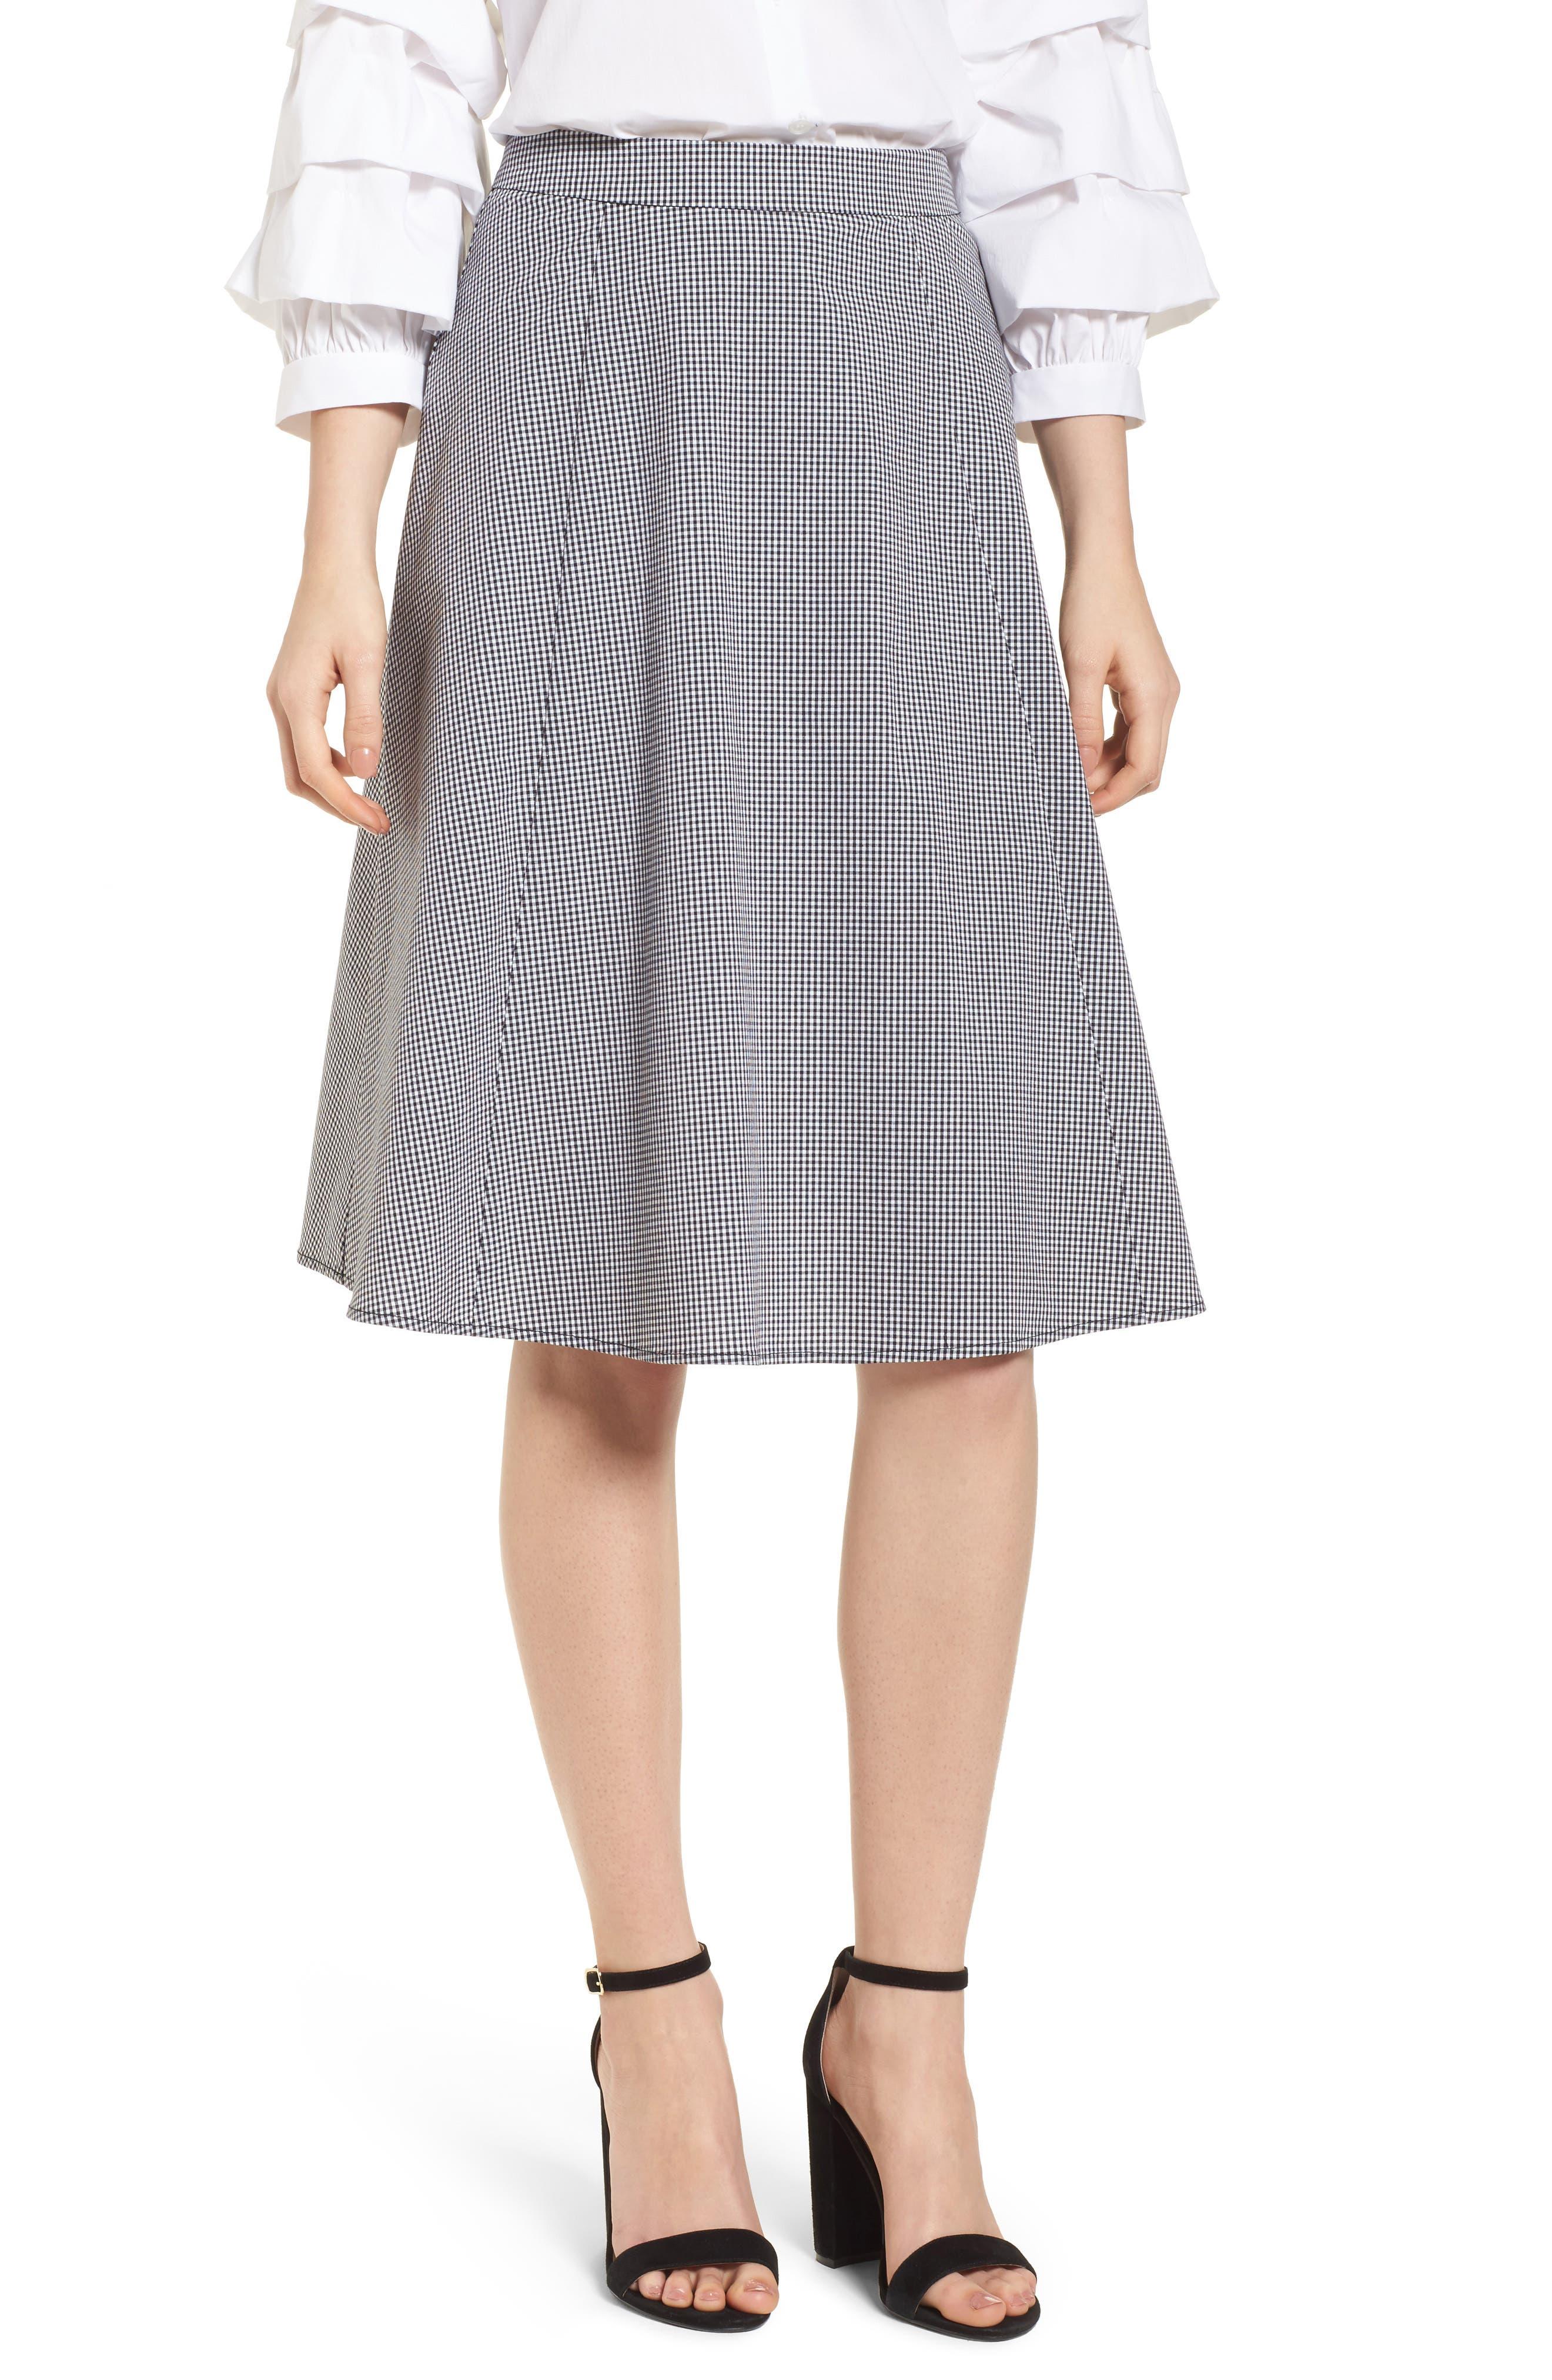 Gingham A-Line Skirt,                             Main thumbnail 1, color,                             Black/ White